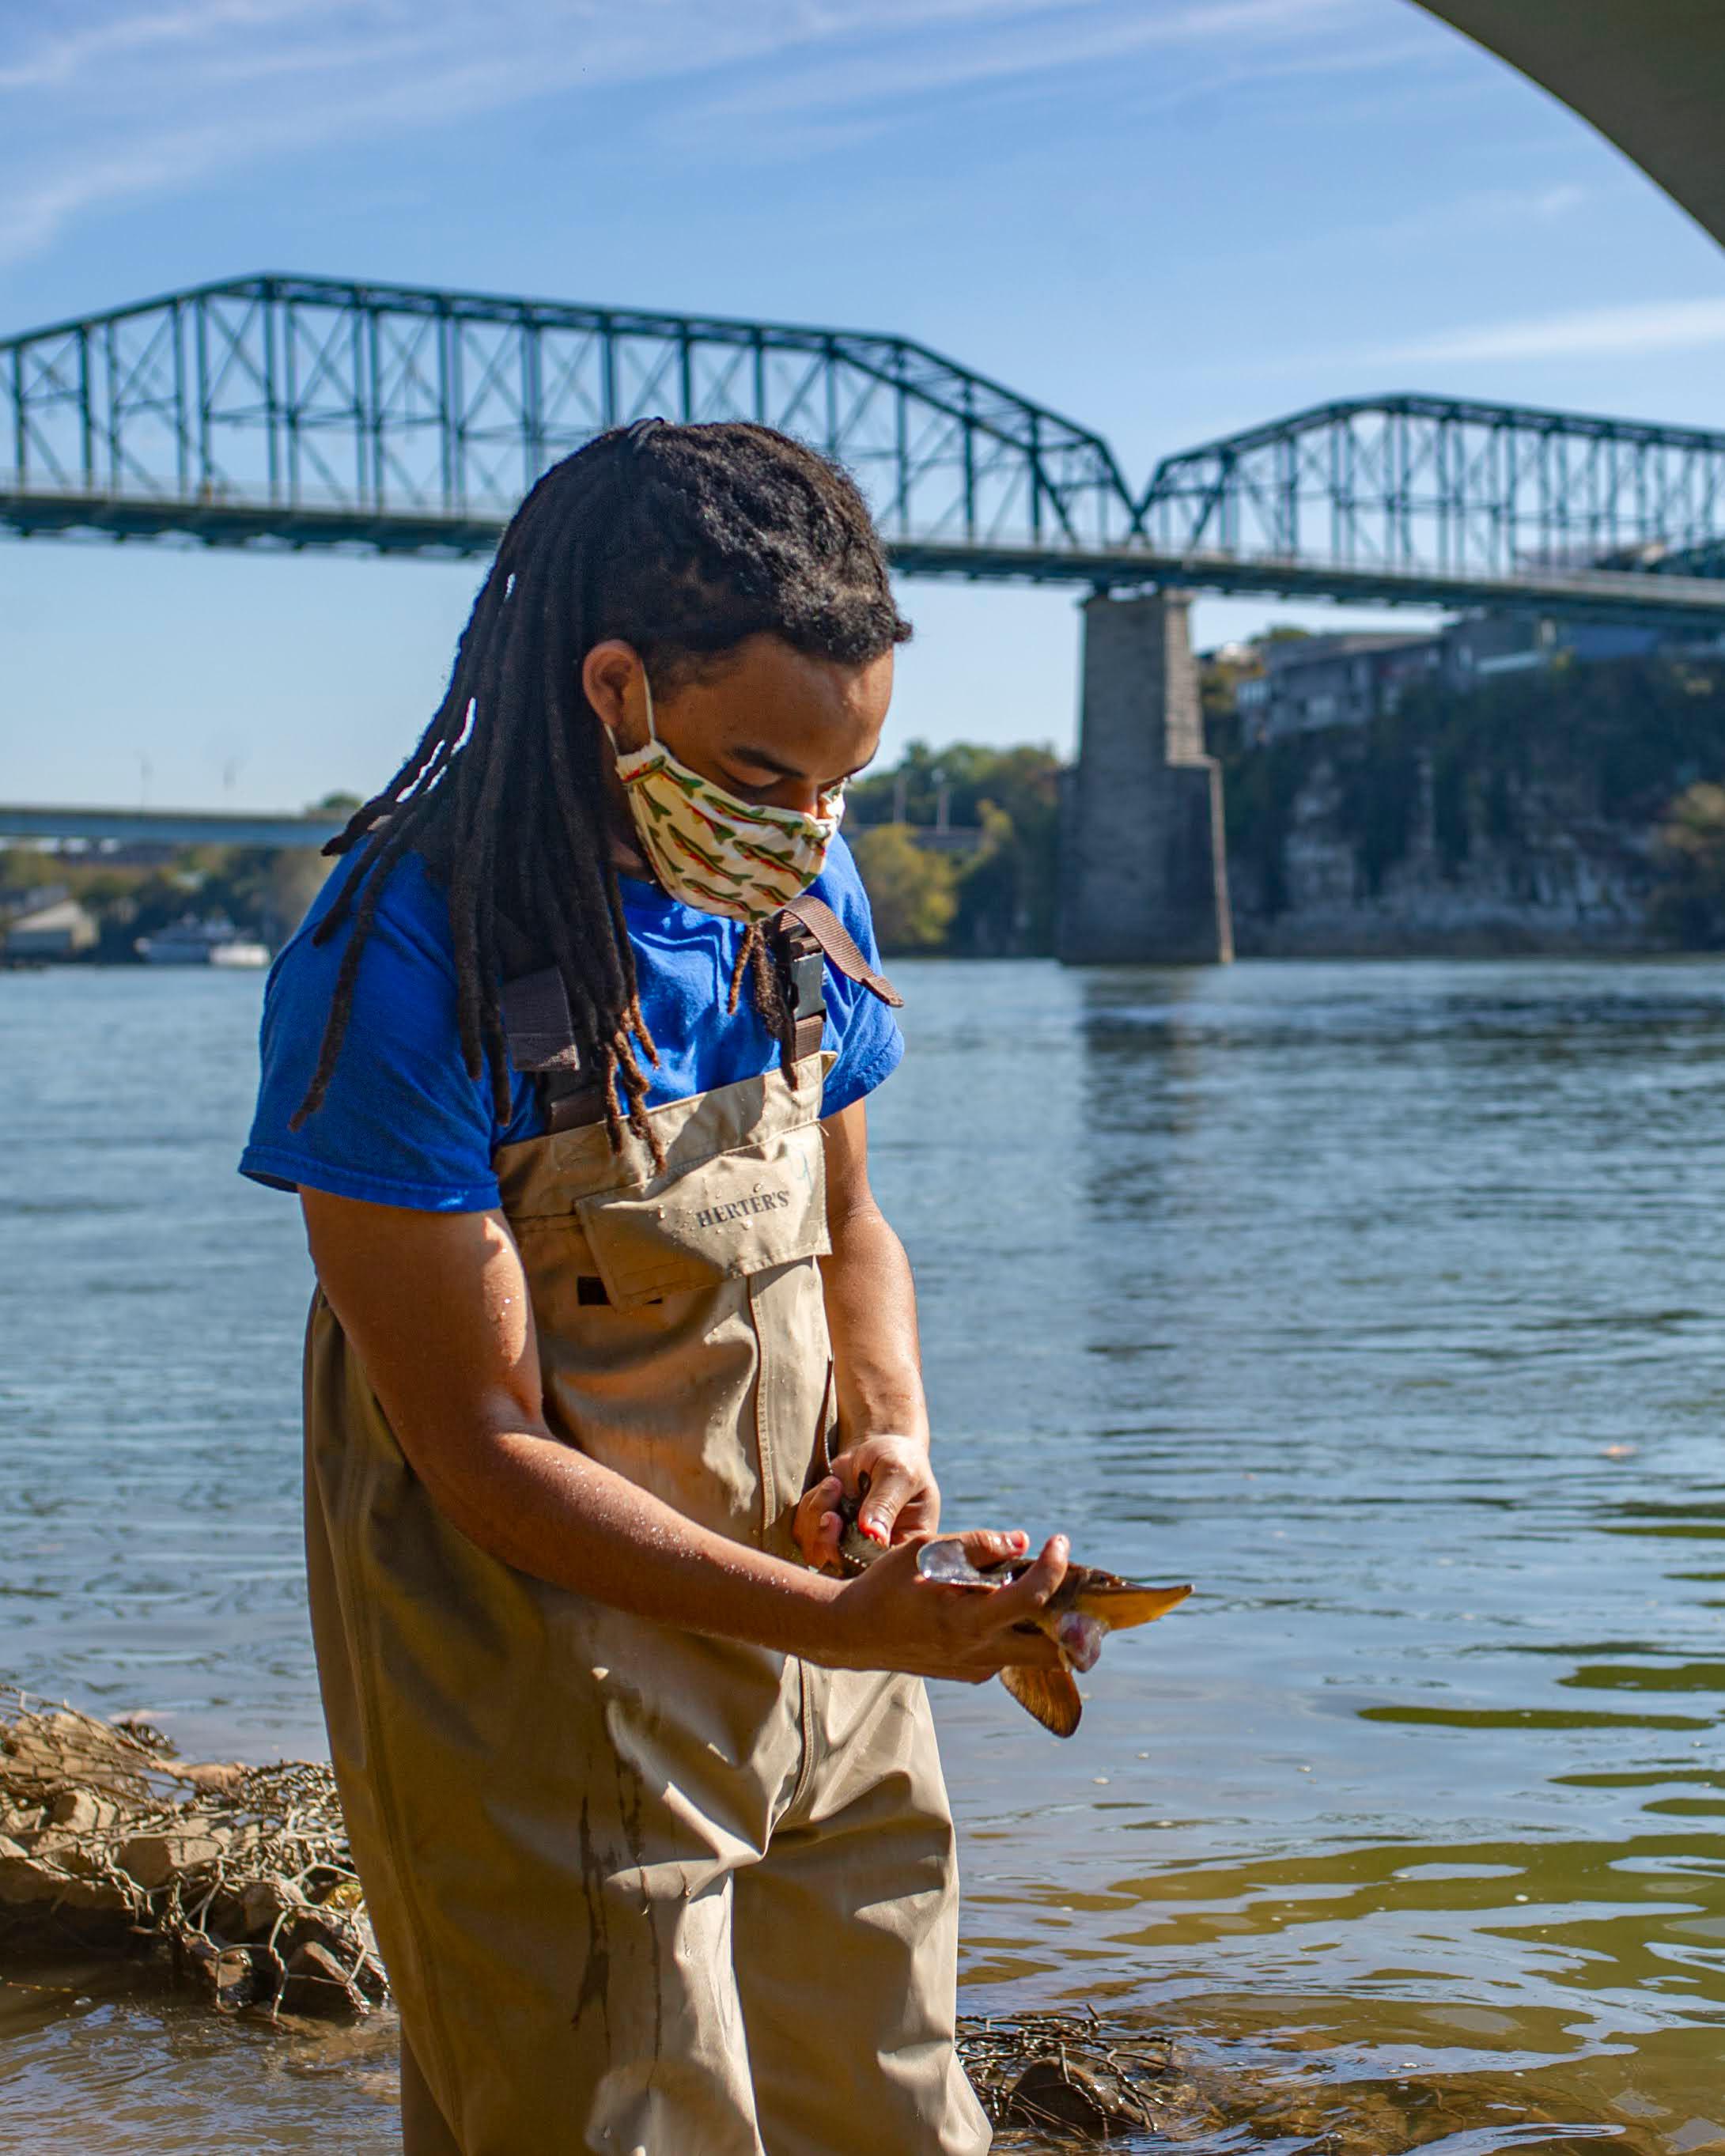 A Tennessee Aquarium employee holding a sturgeon